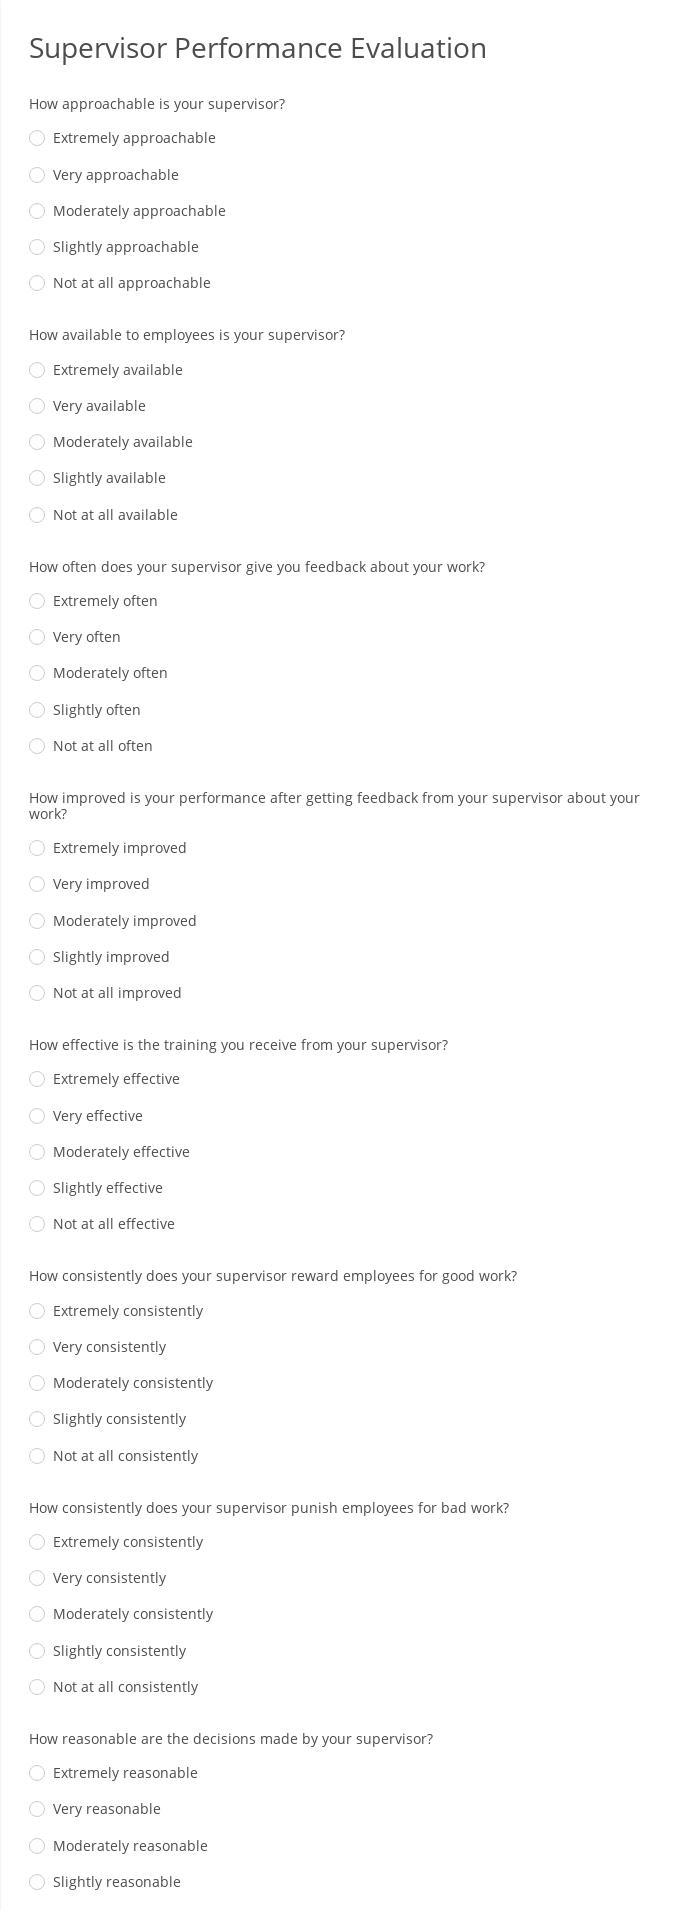 Supervisor Performance Evaluation